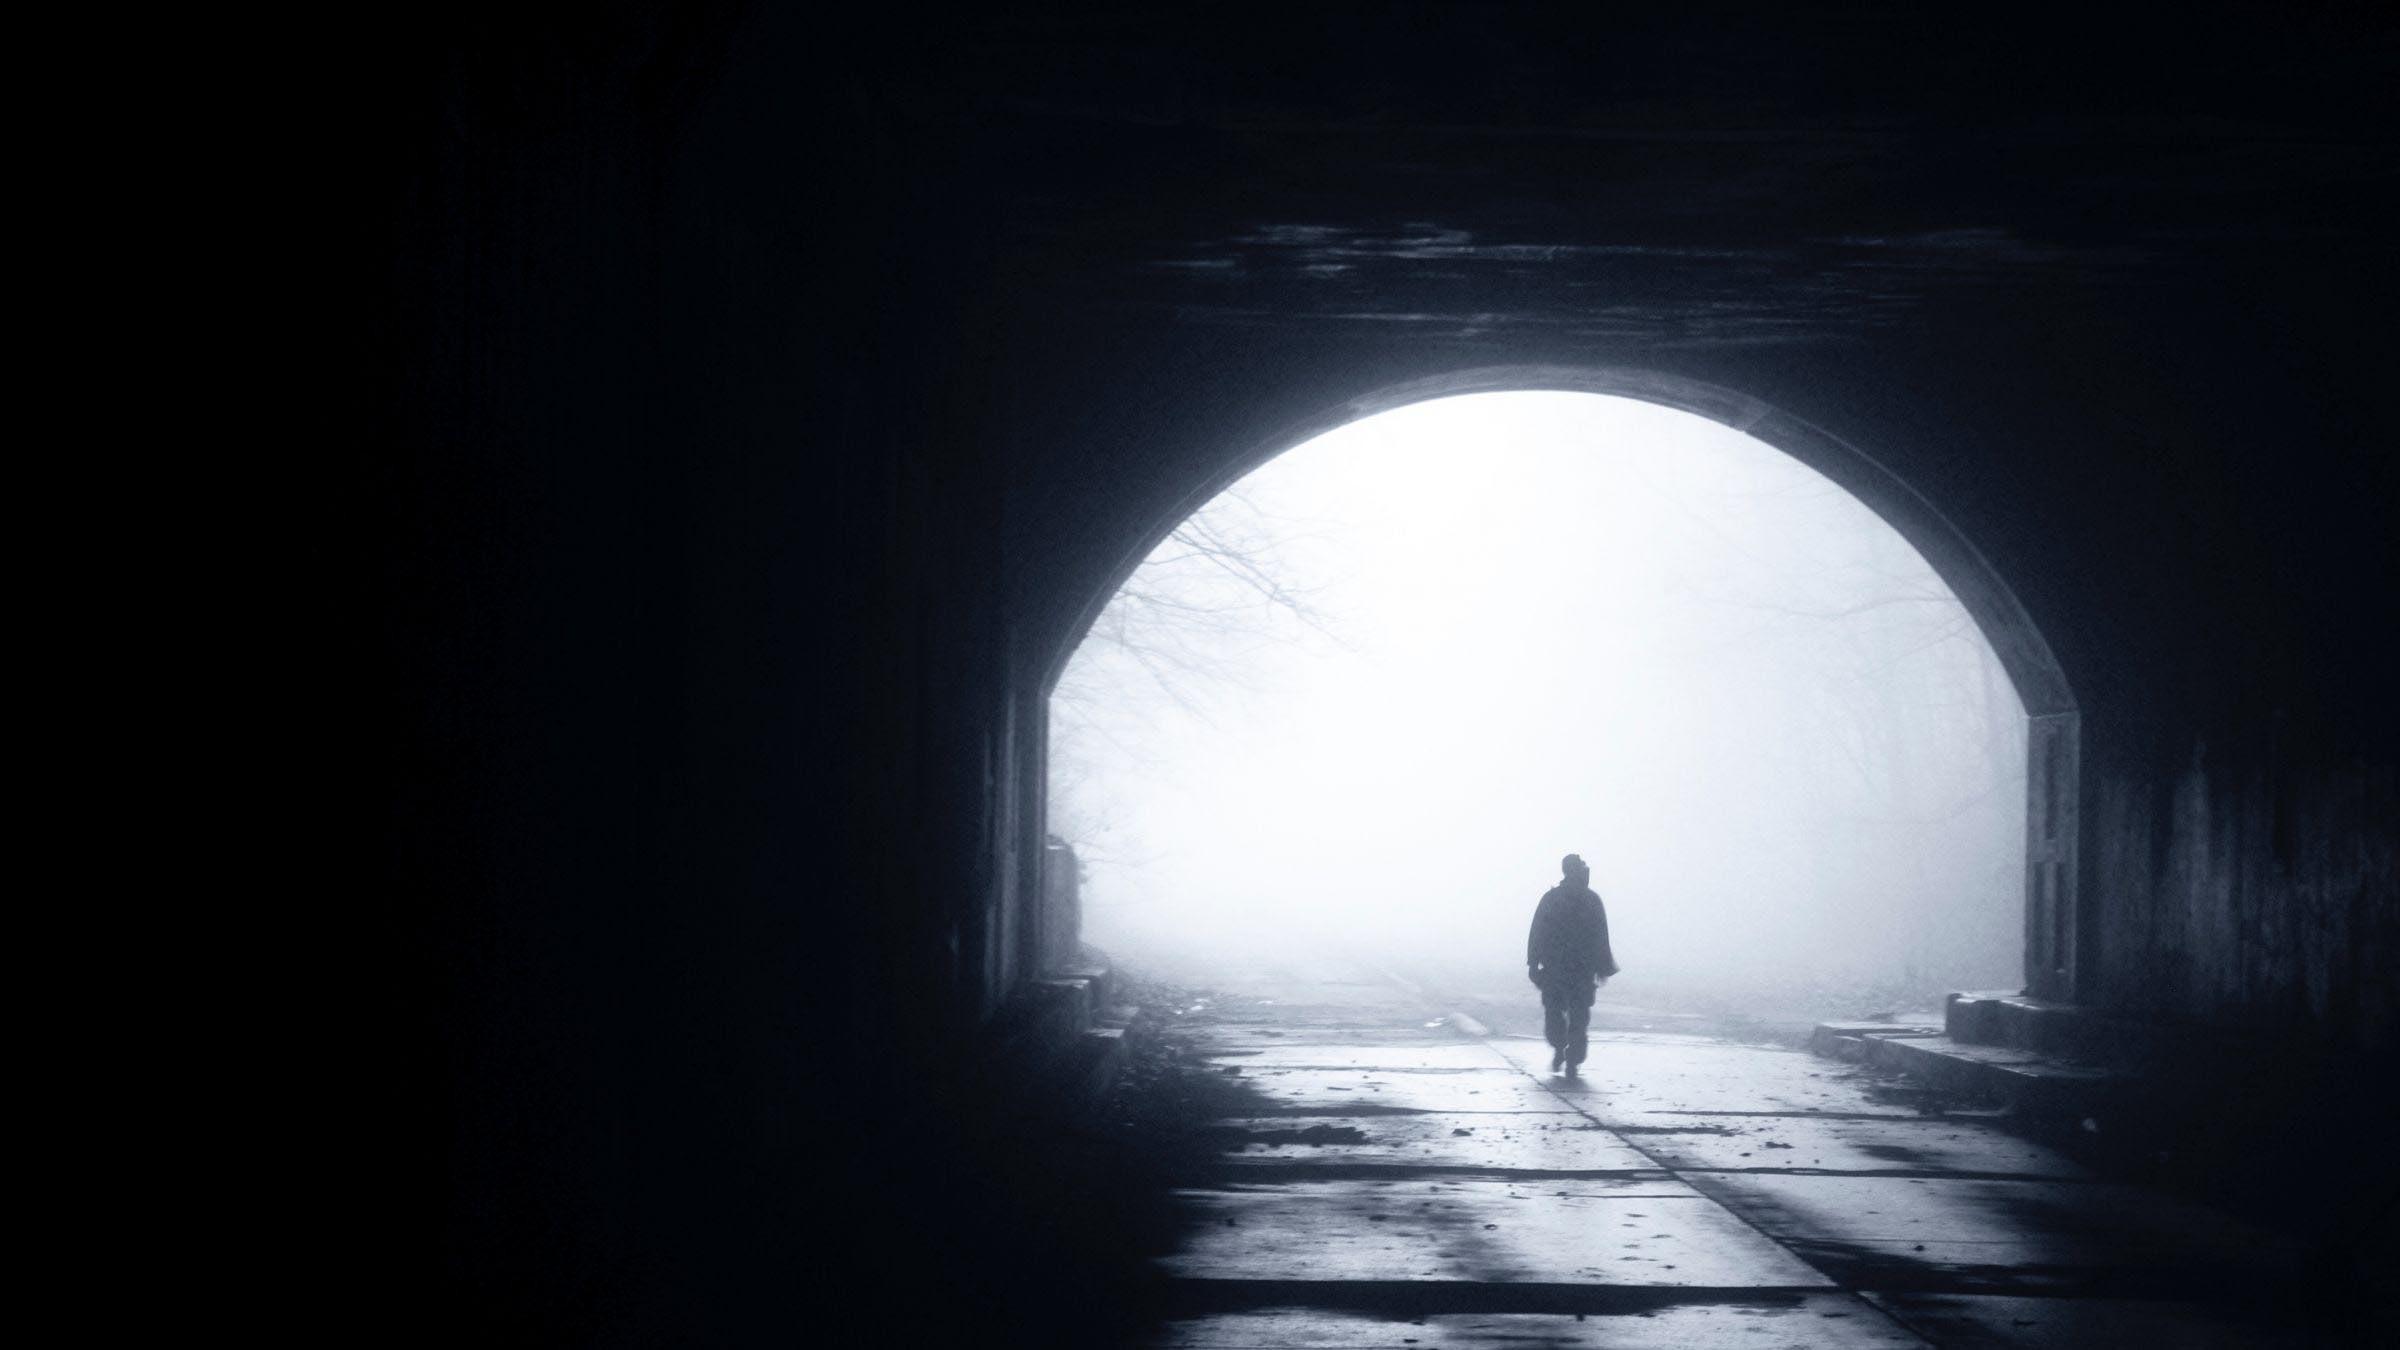 Turn Dark Tunnels into Bridges of Light